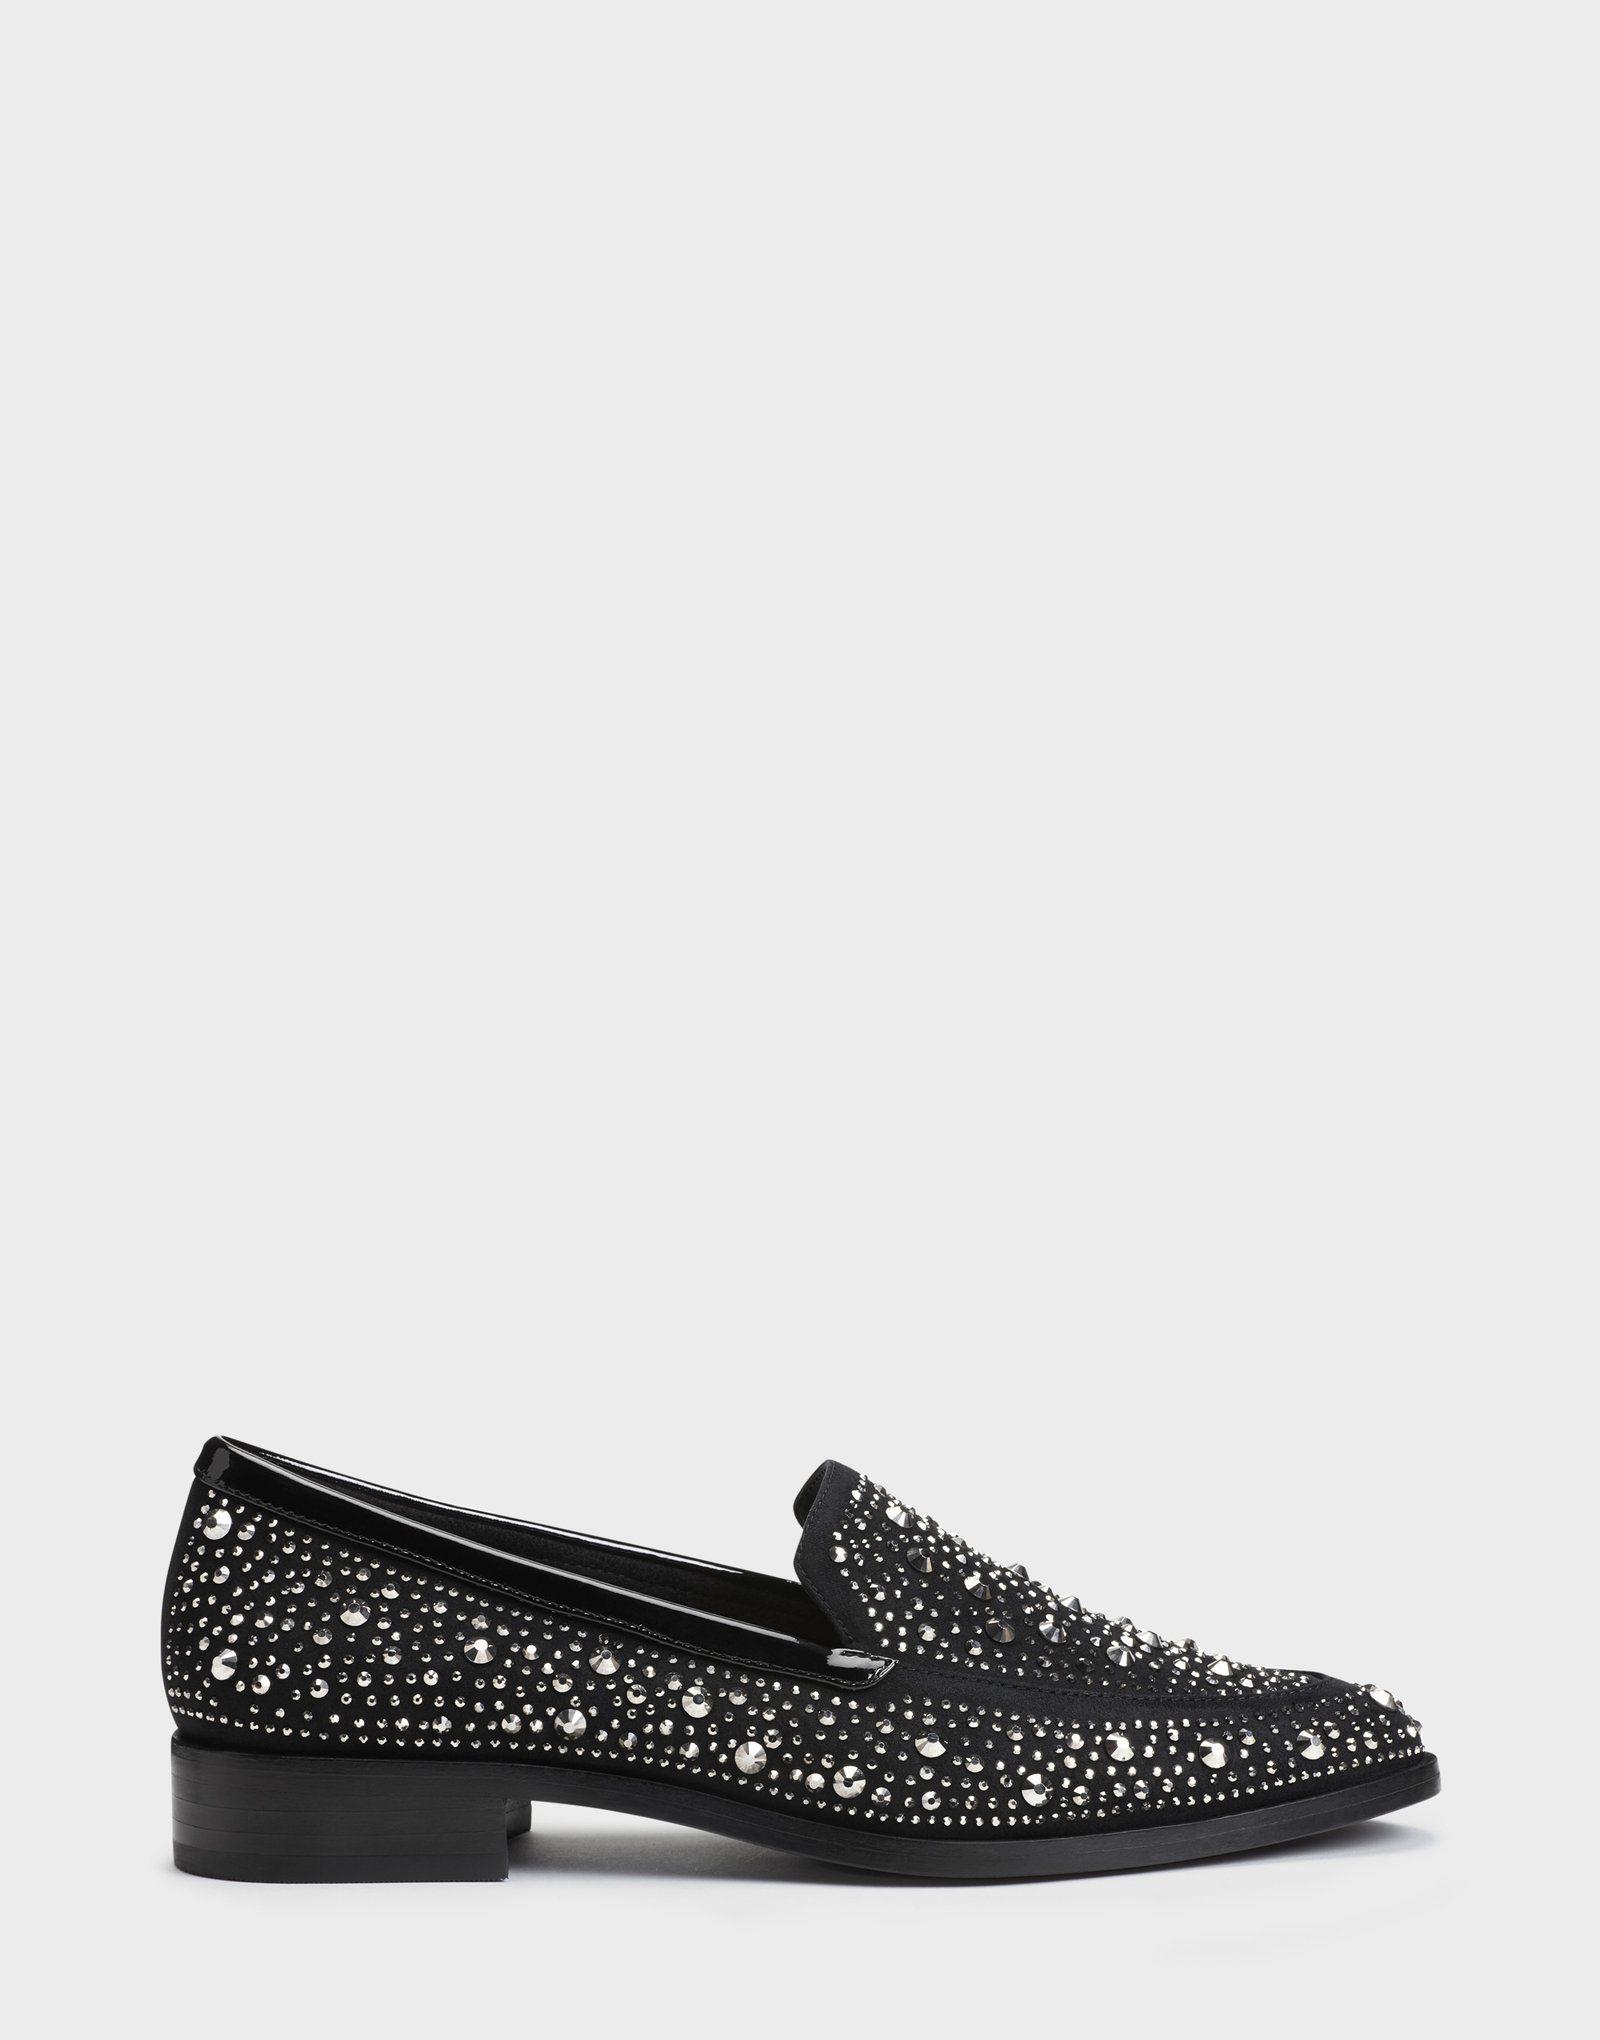 East End – Aerosoles   Loafers, Dress